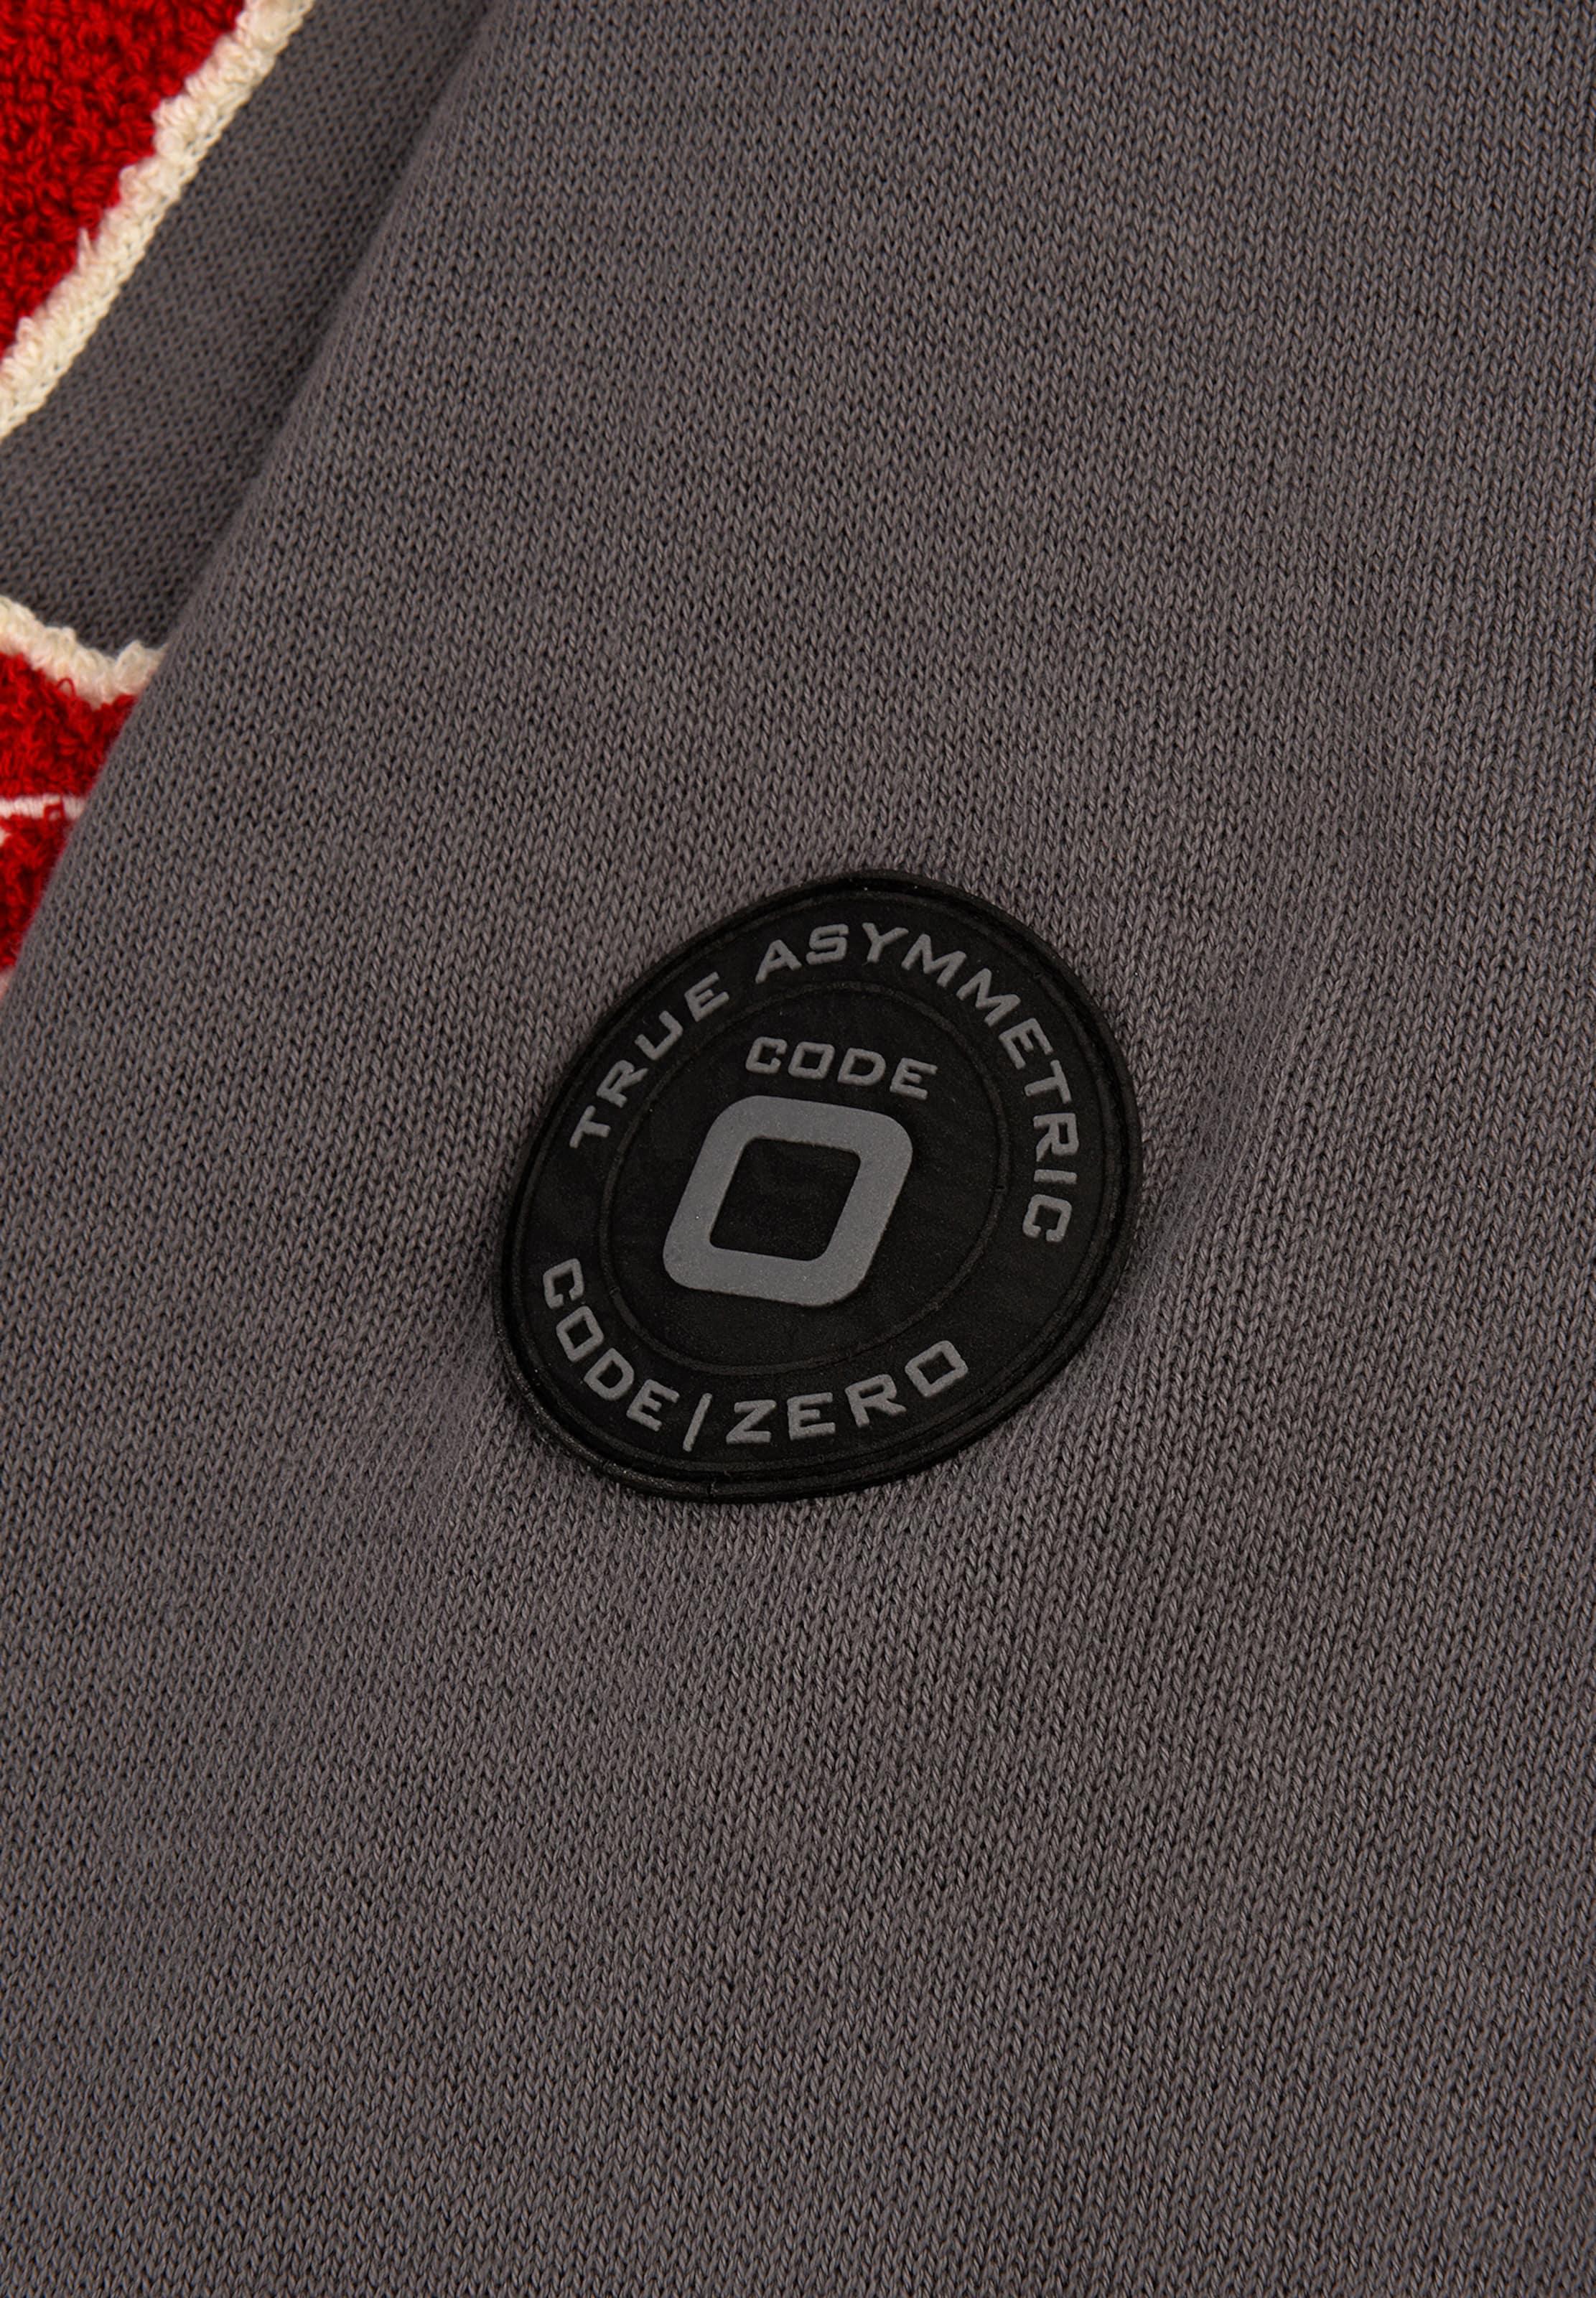 Weiß In Code DunkelgrauRot 'leeward' zero Sweater POXuwZikT